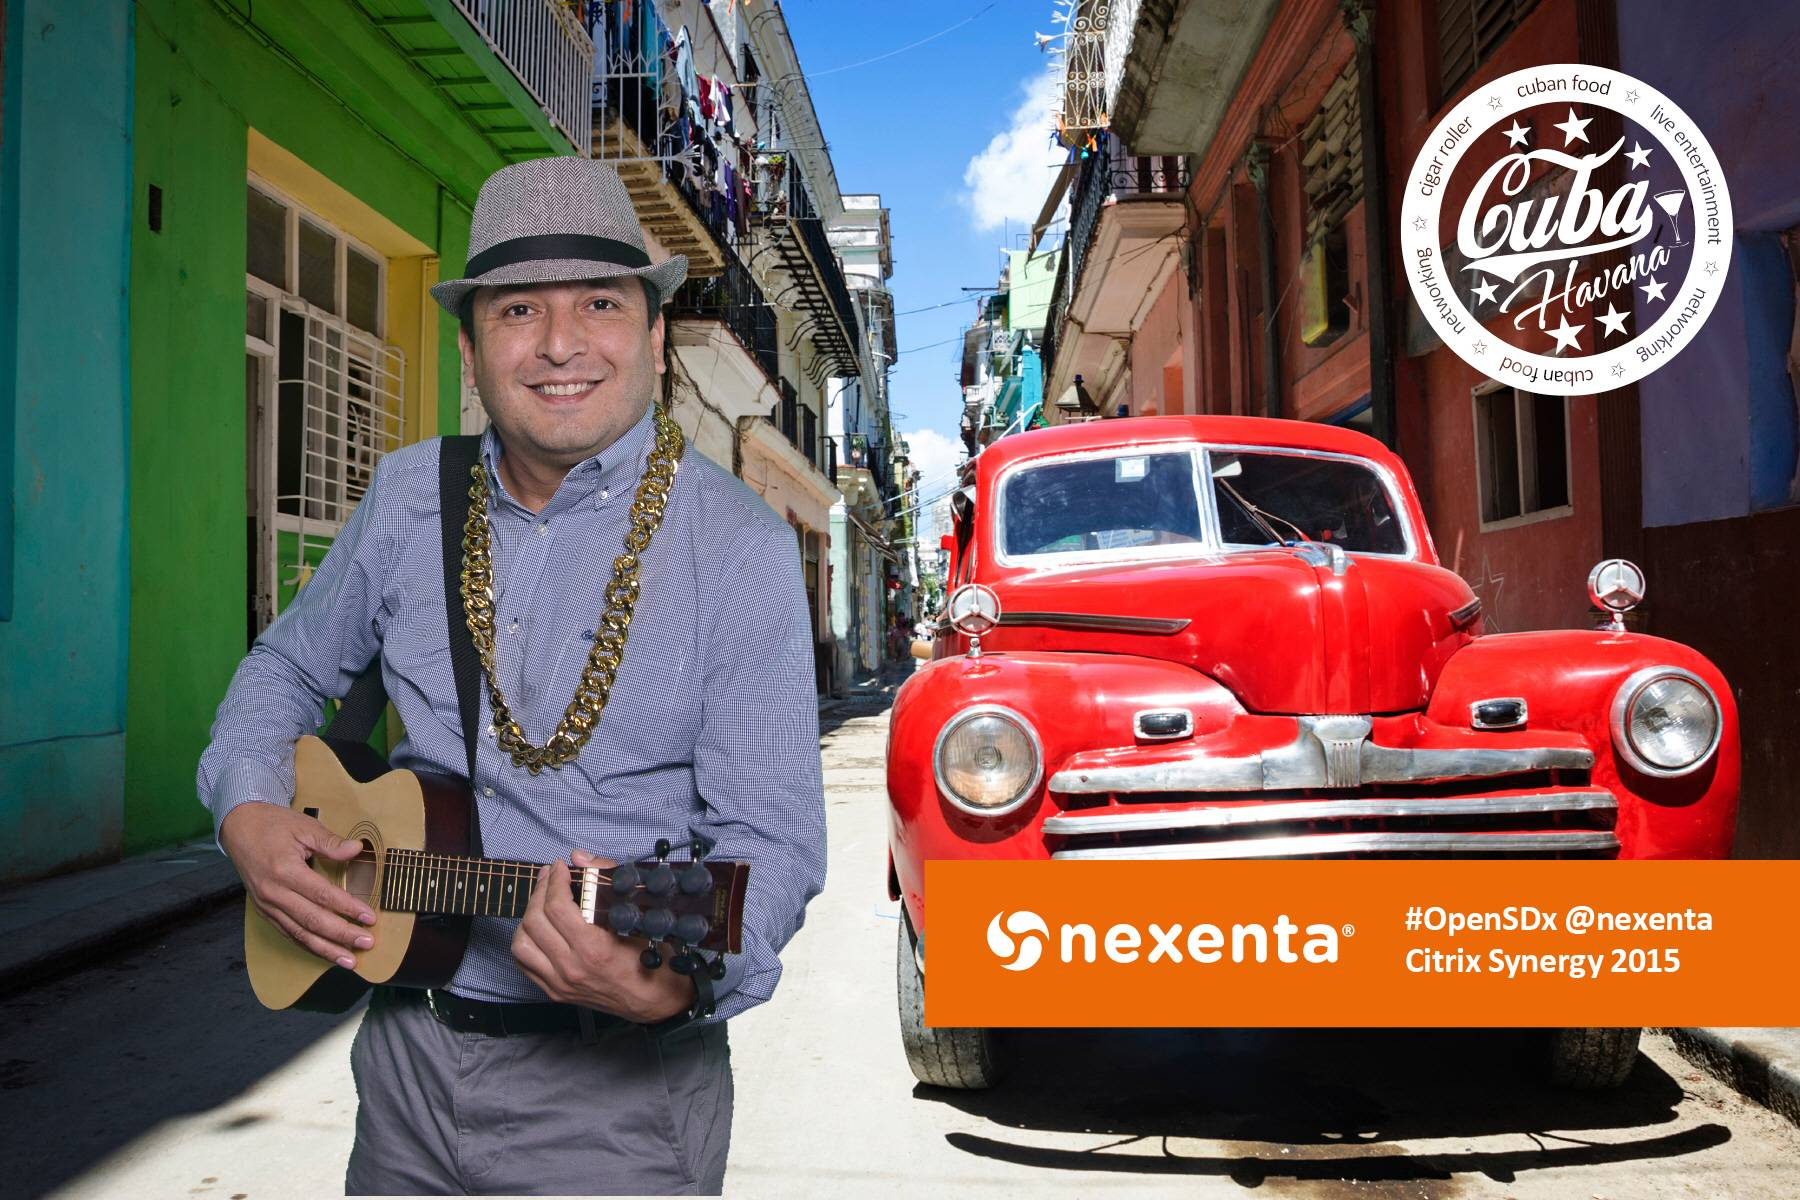 Places, destinations, Cuba, Green Screen Photo Booth